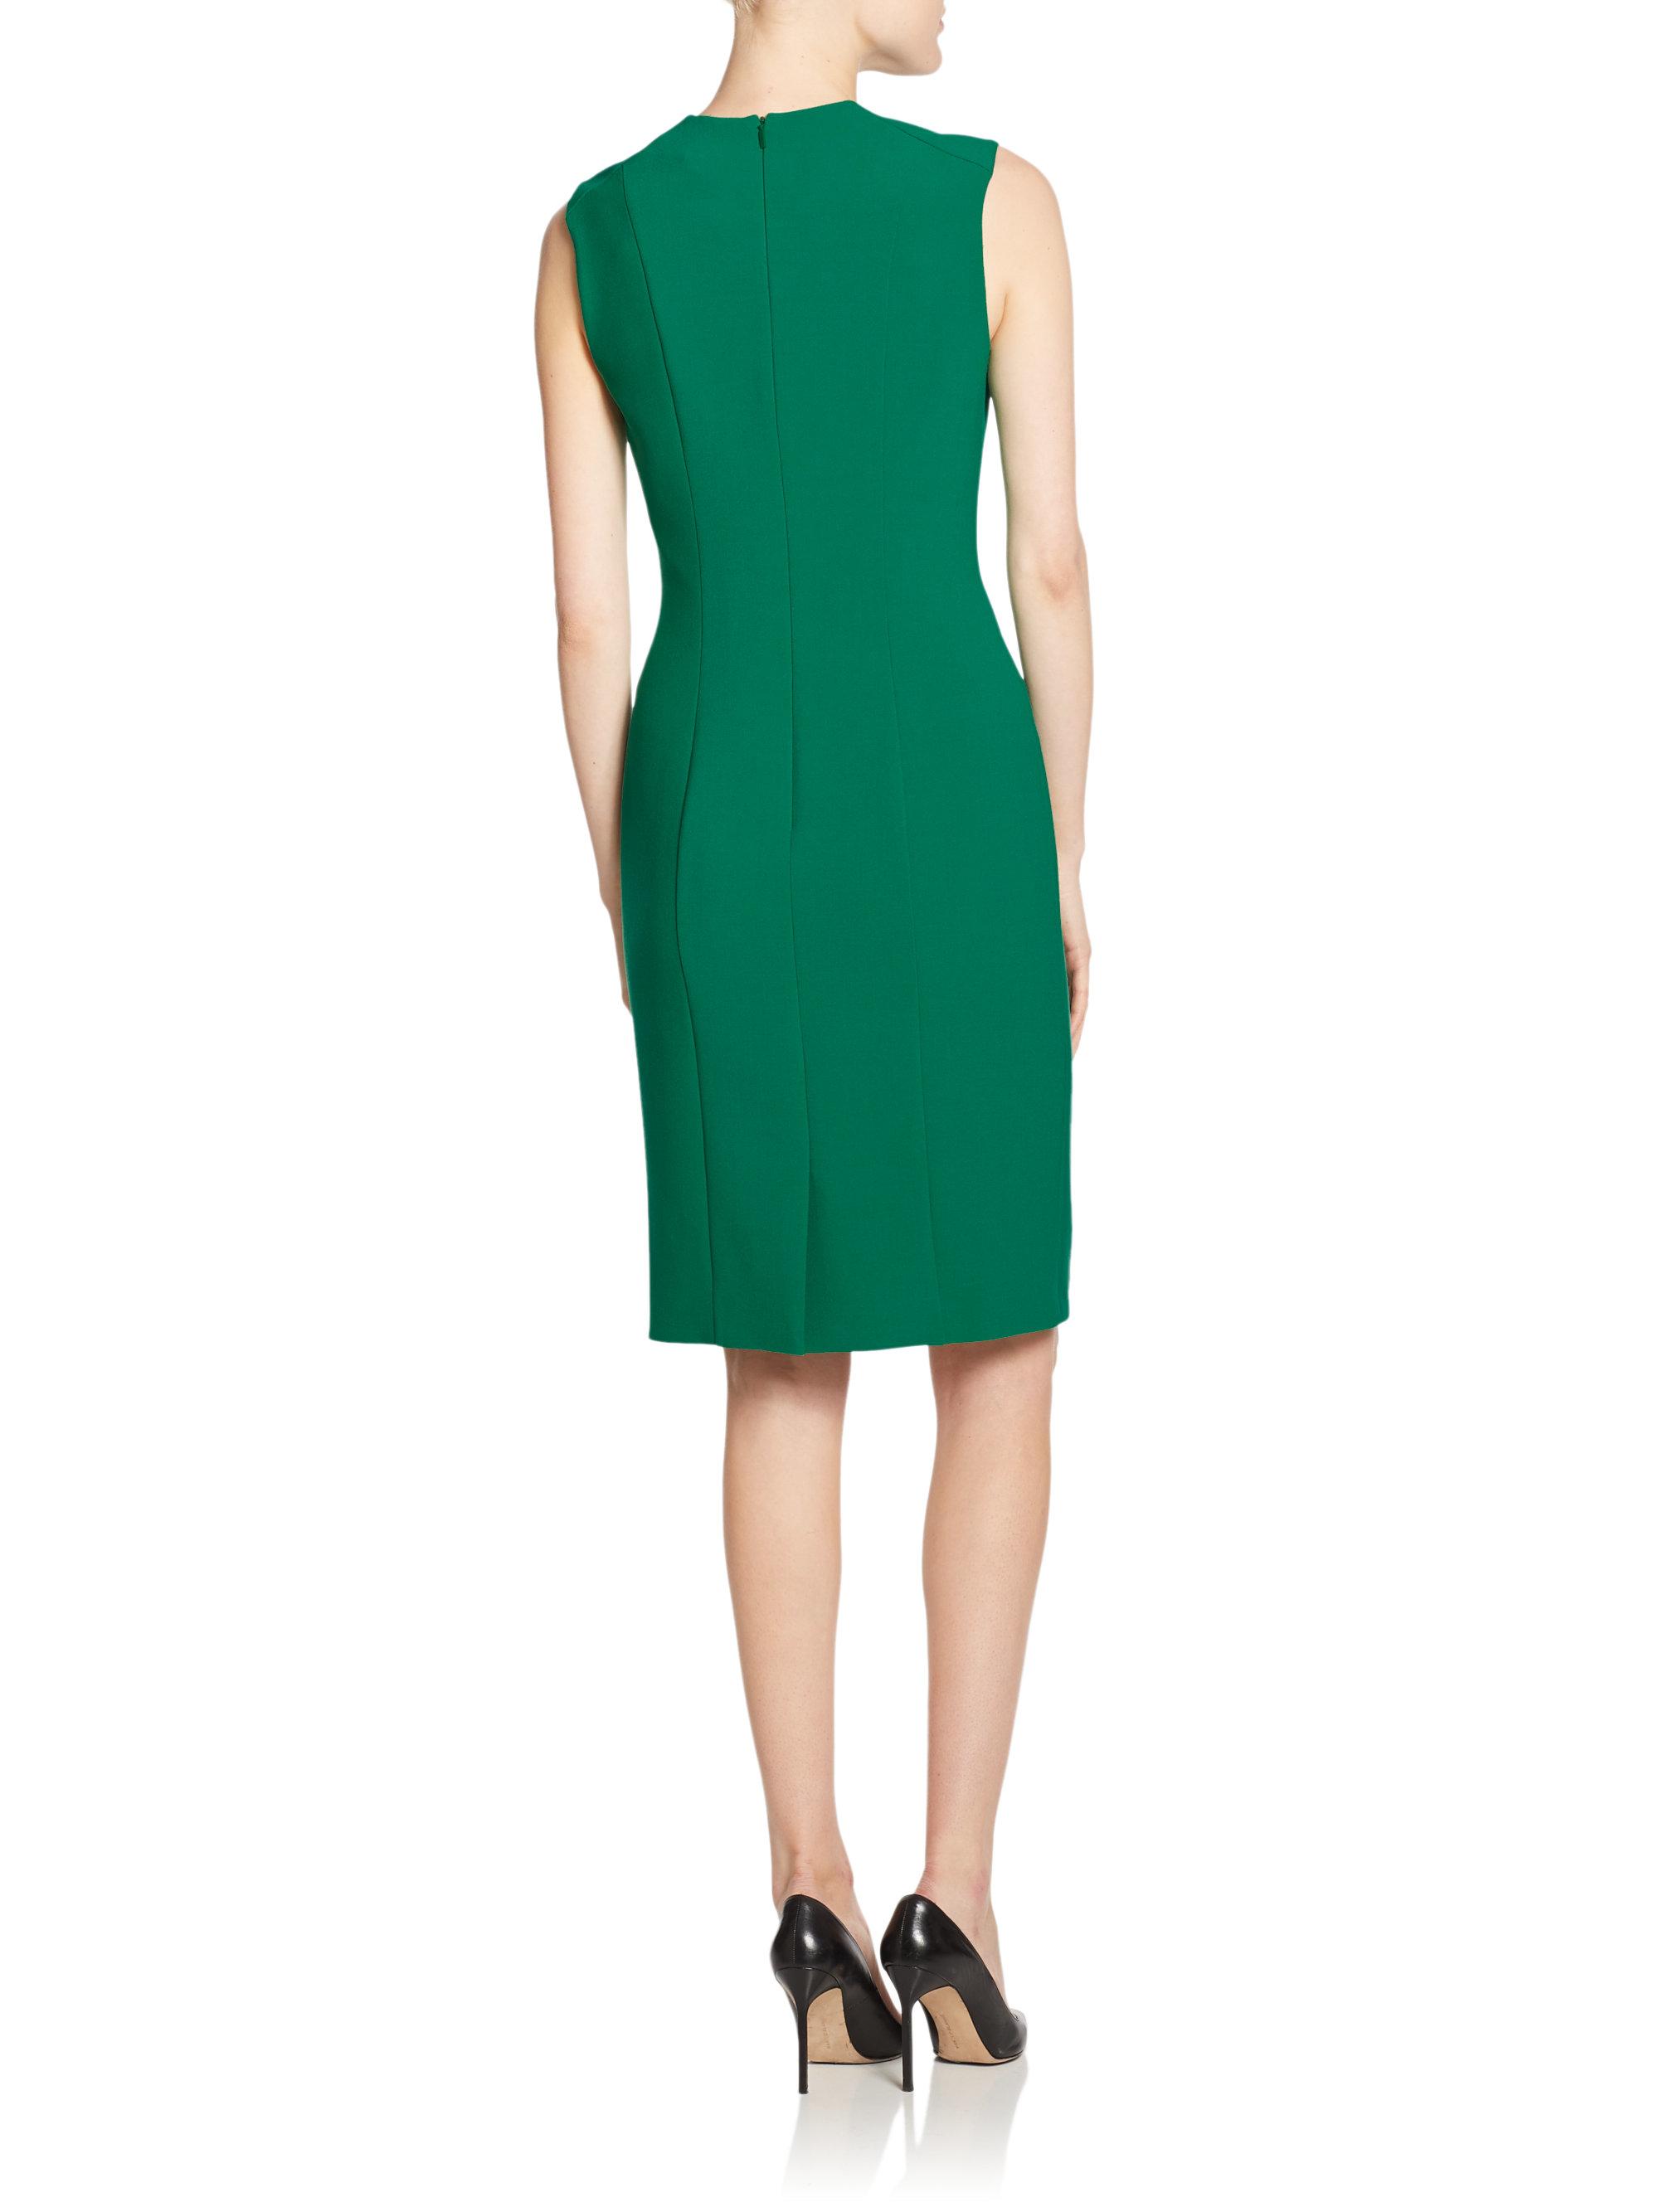 Saks Fifth Avenue Designer Dress Sale